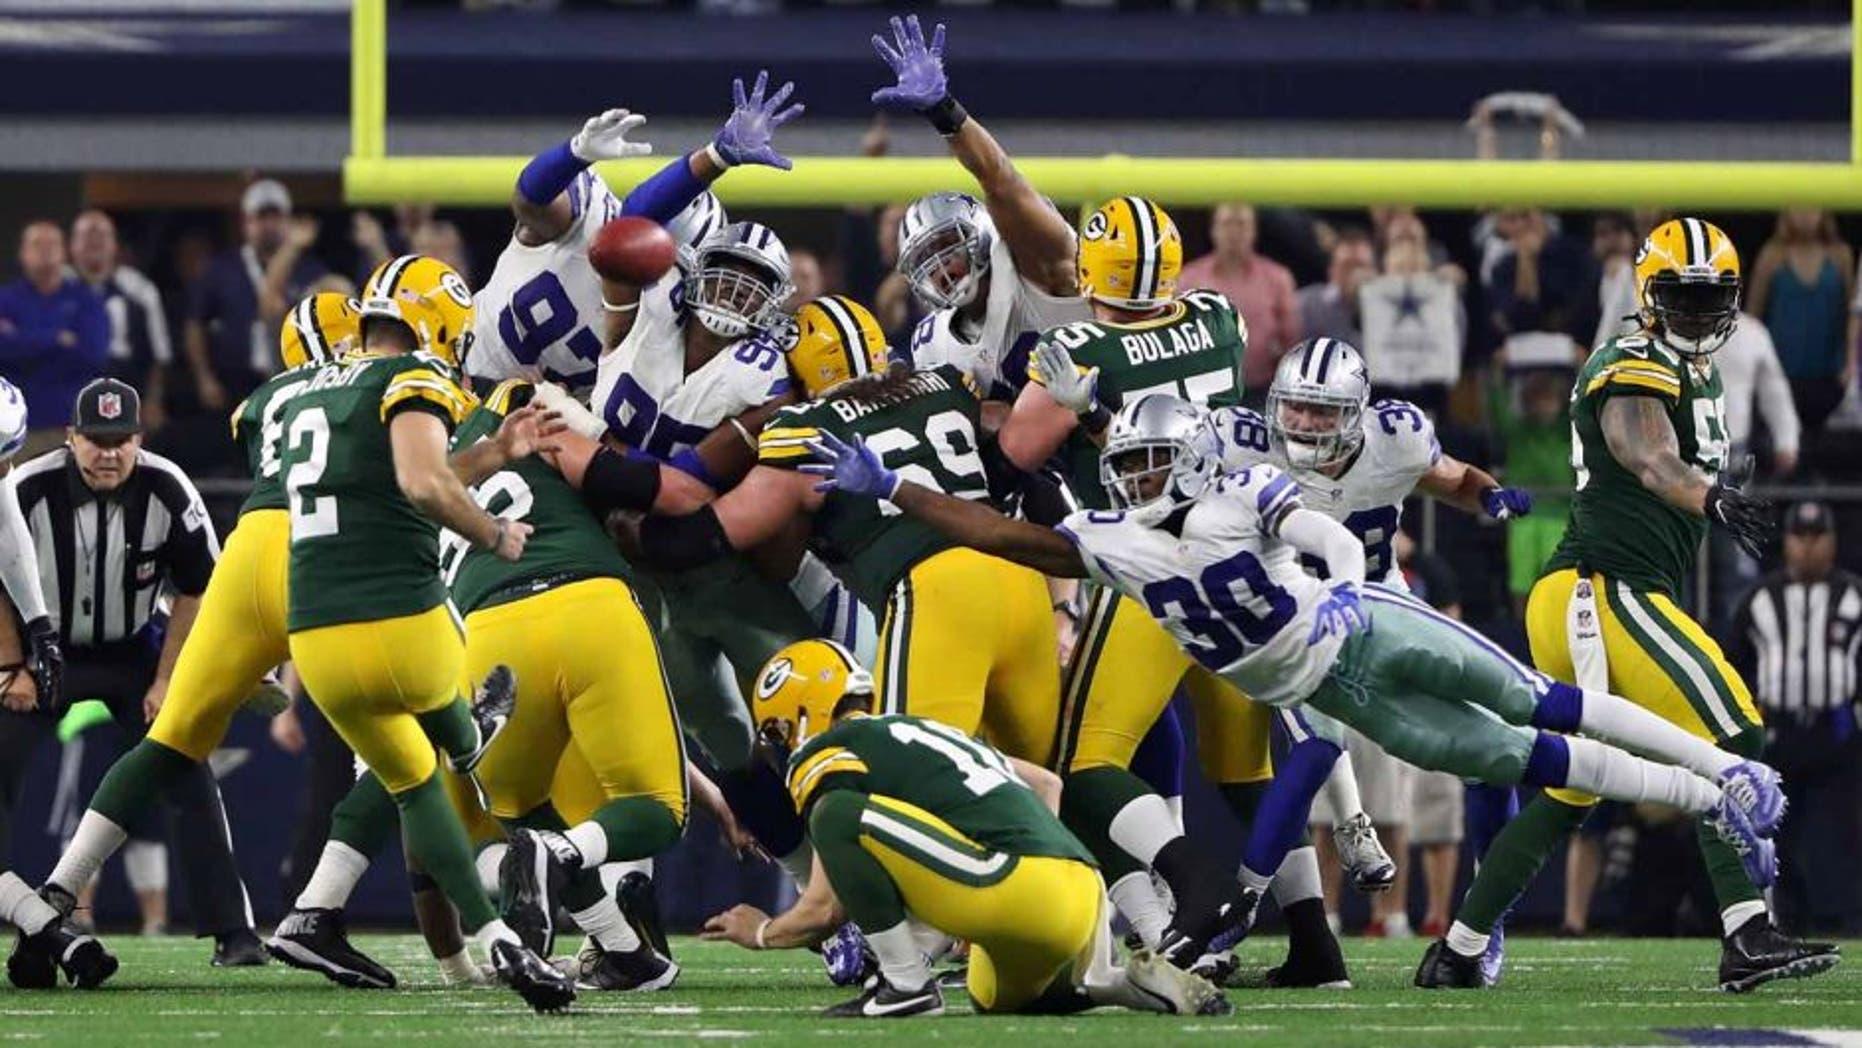 Jan 15, 2017; Arlington, TX, USA; Green Bay Packers kicker Mason Crosby (2) kicks the game winning field goal during the fourth quarter against the Dallas Cowboys in the NFC Divisional playoff game at AT&T Stadium. Mandatory Credit: Kevin Jairaj-USA TODAY Sports